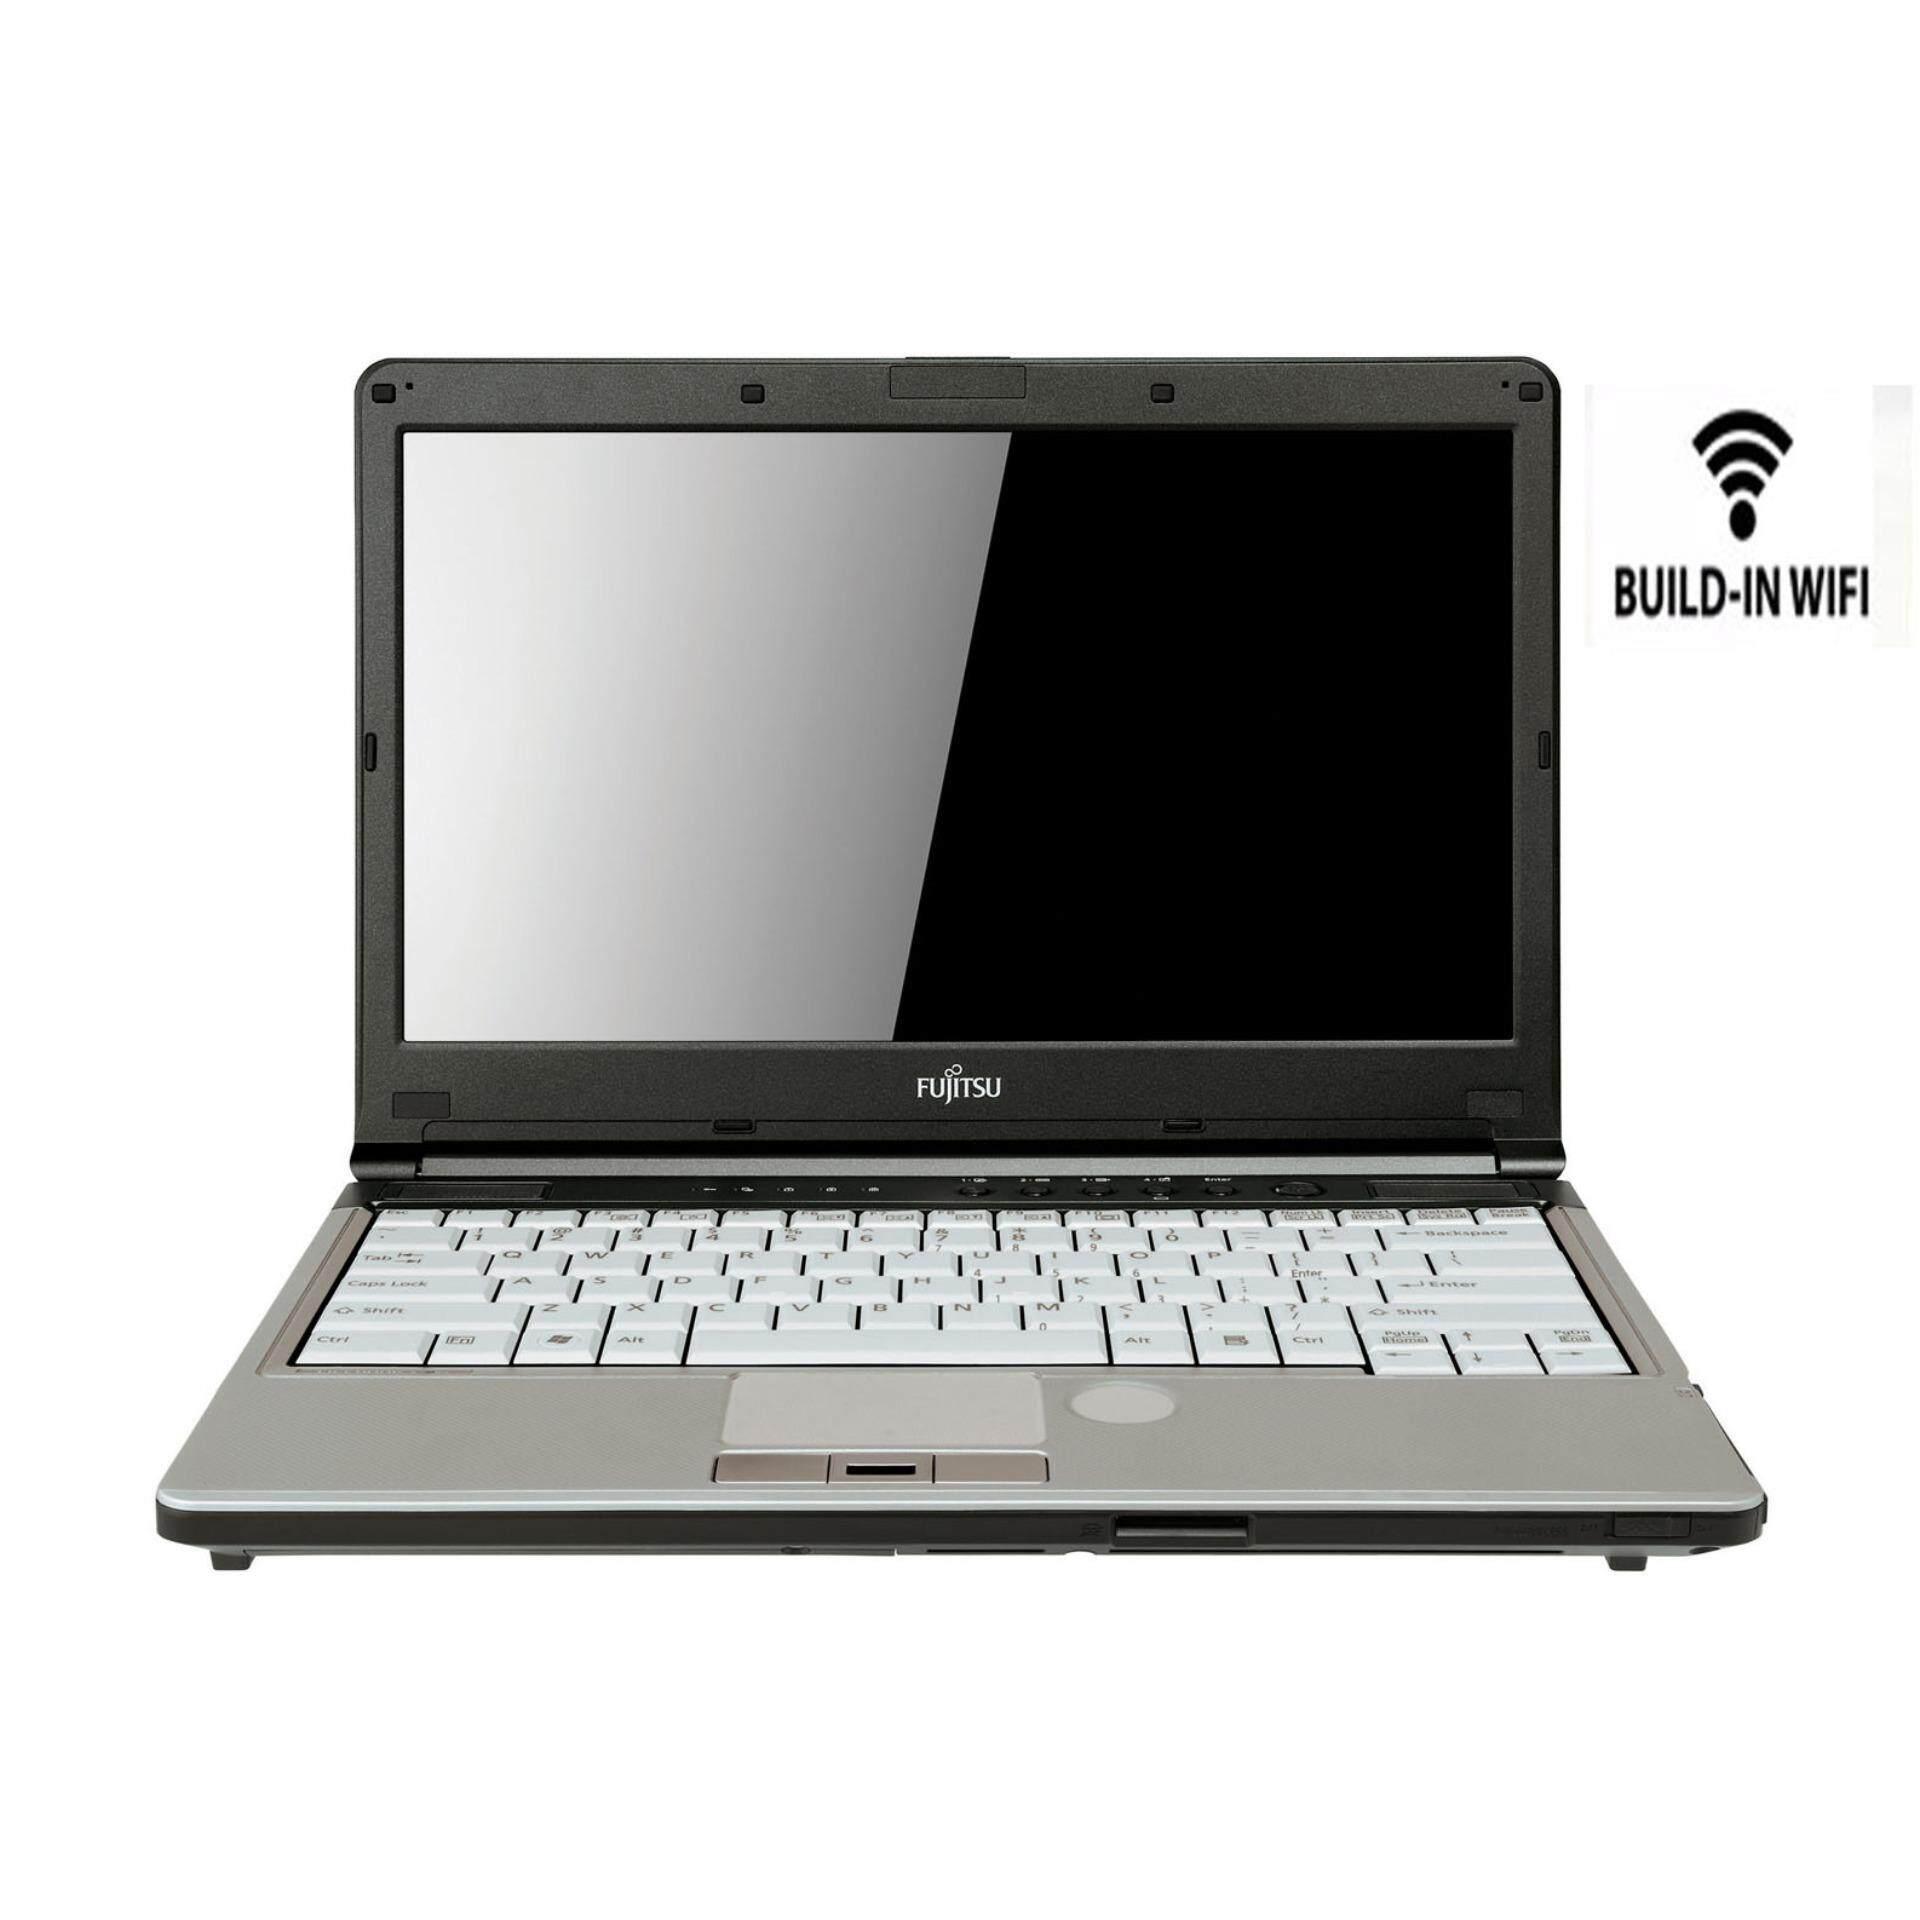 Fujitsu lifebook 13.3 Celeron 2gb ddr3 160gb hdd build-in wifi laptop notebook ( Refurbished ) Malaysia